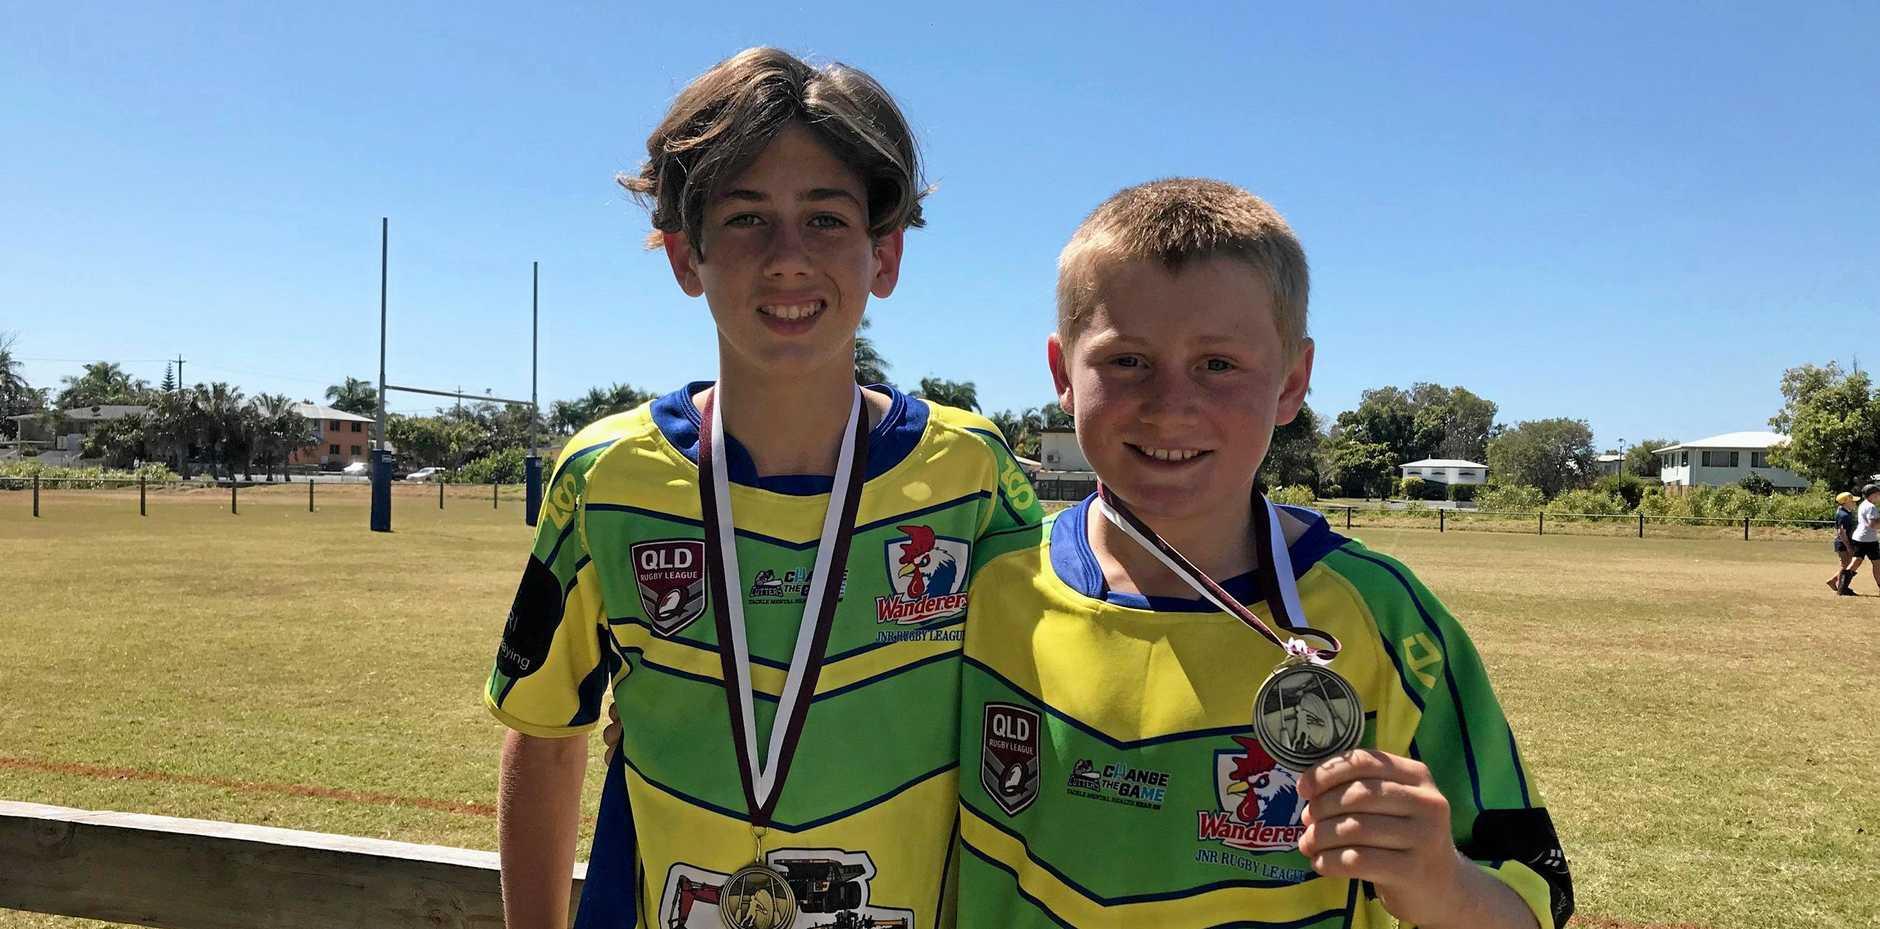 Wanderers Under-13 players Fraser Camilleri aKooper Shears saved won their team the 2019 grand final.